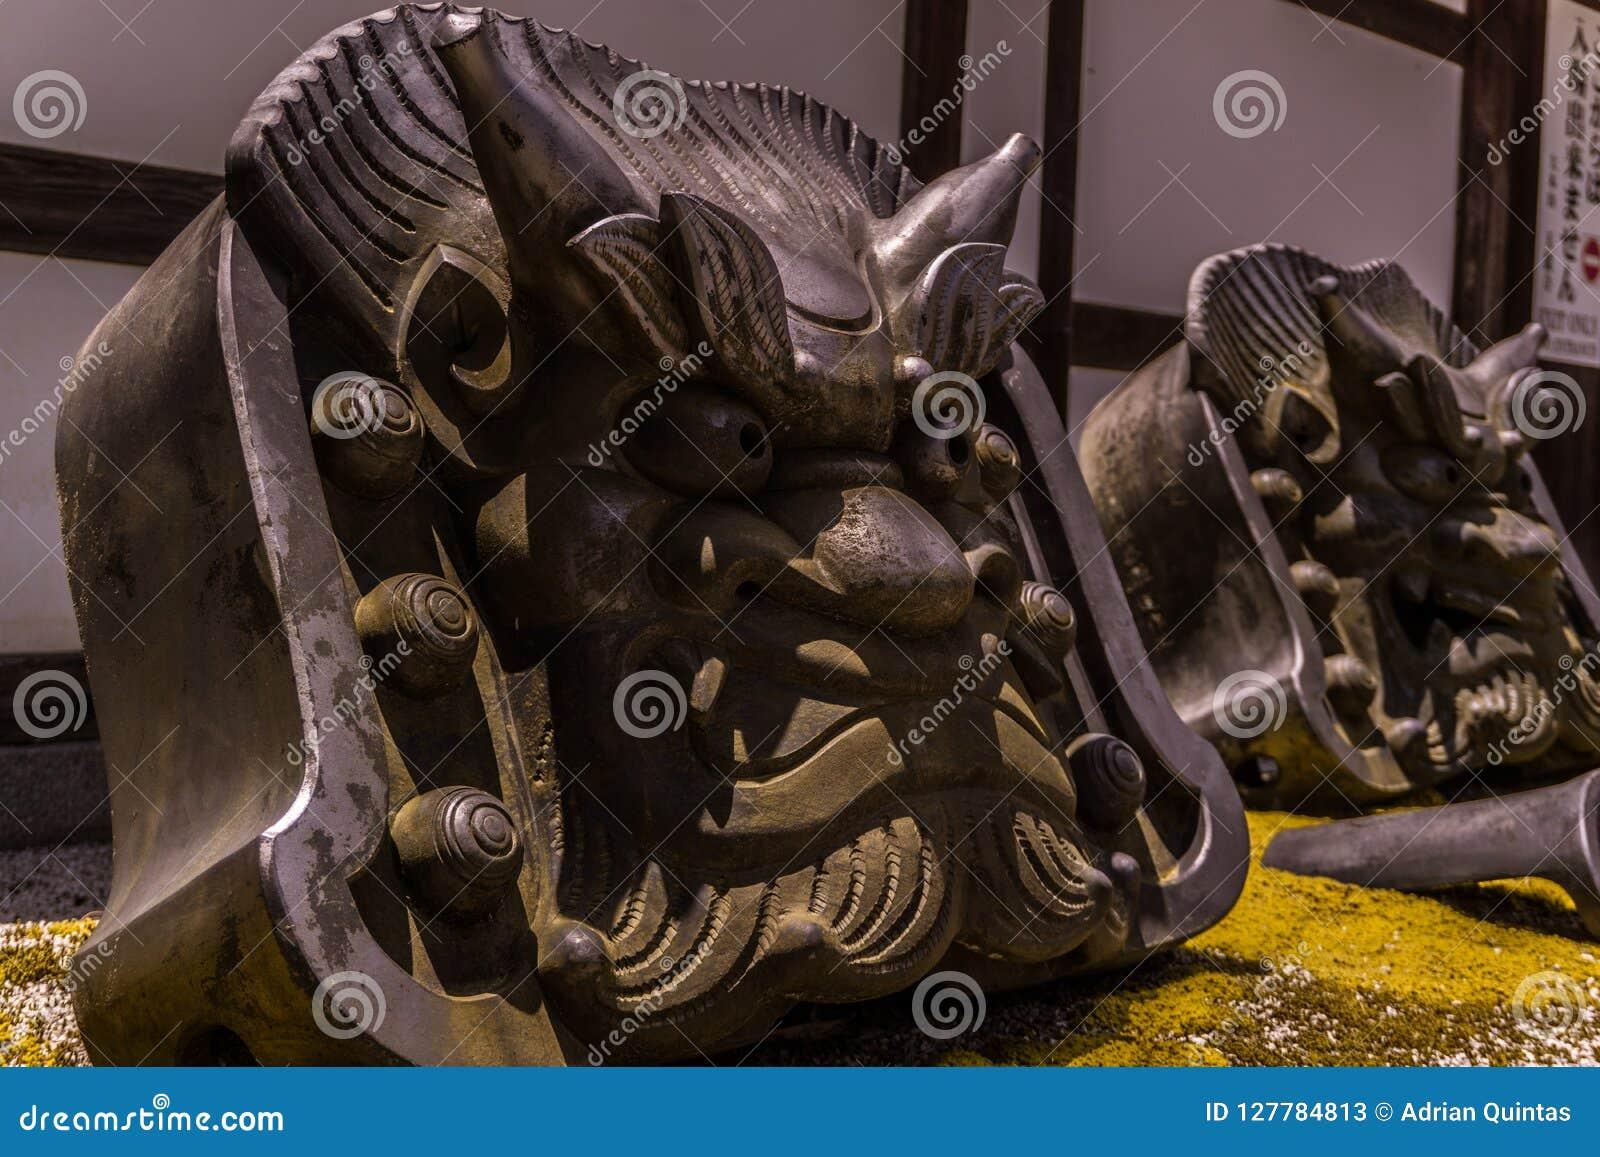 Demon oni stones protectors of the temple